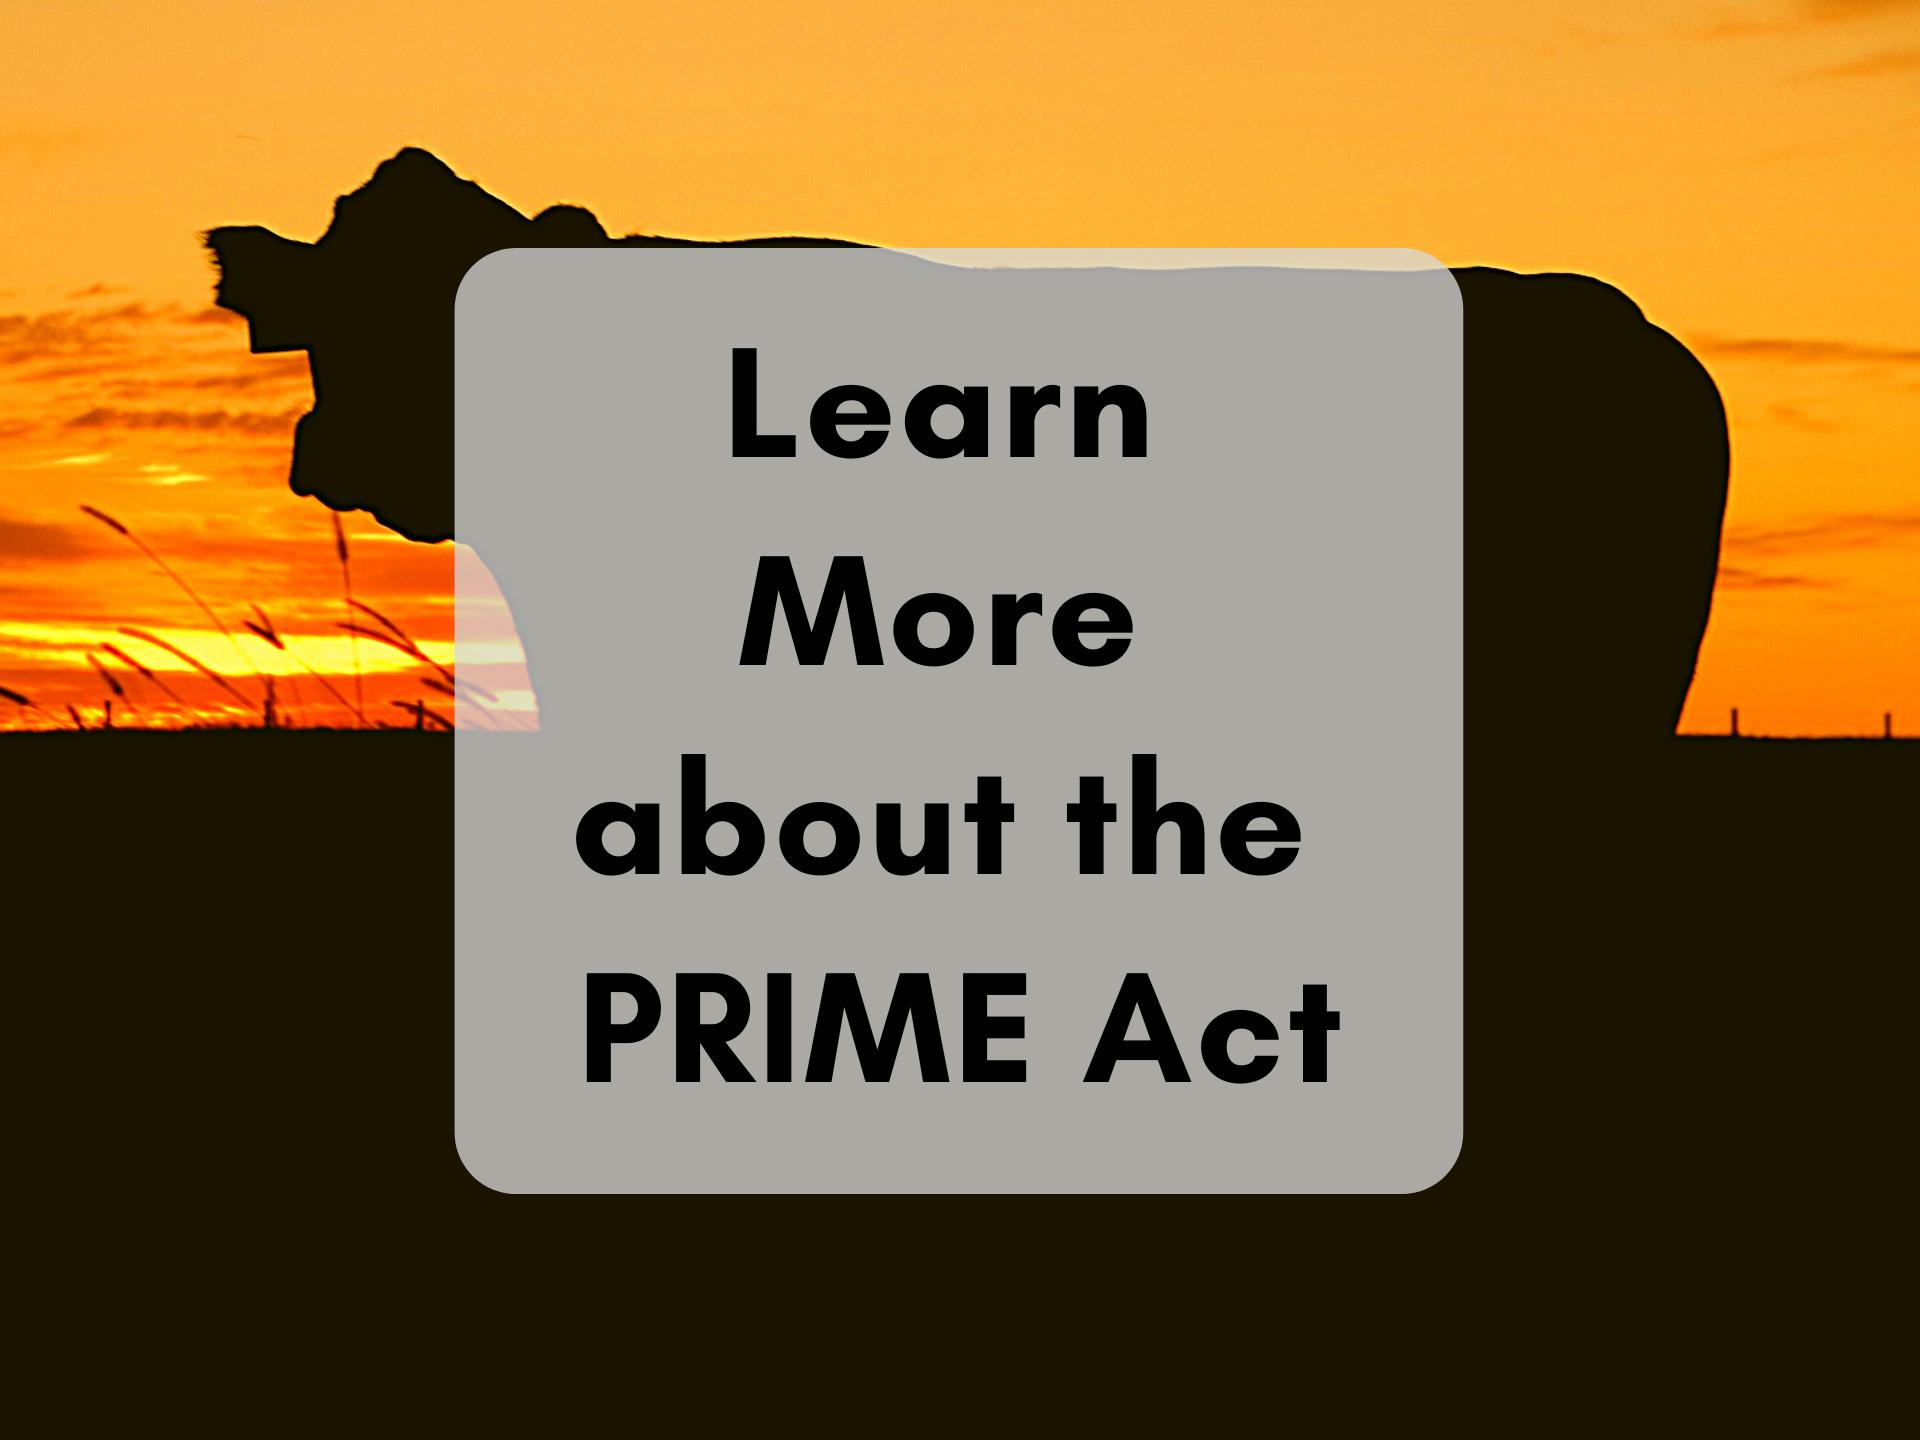 PRIME Act